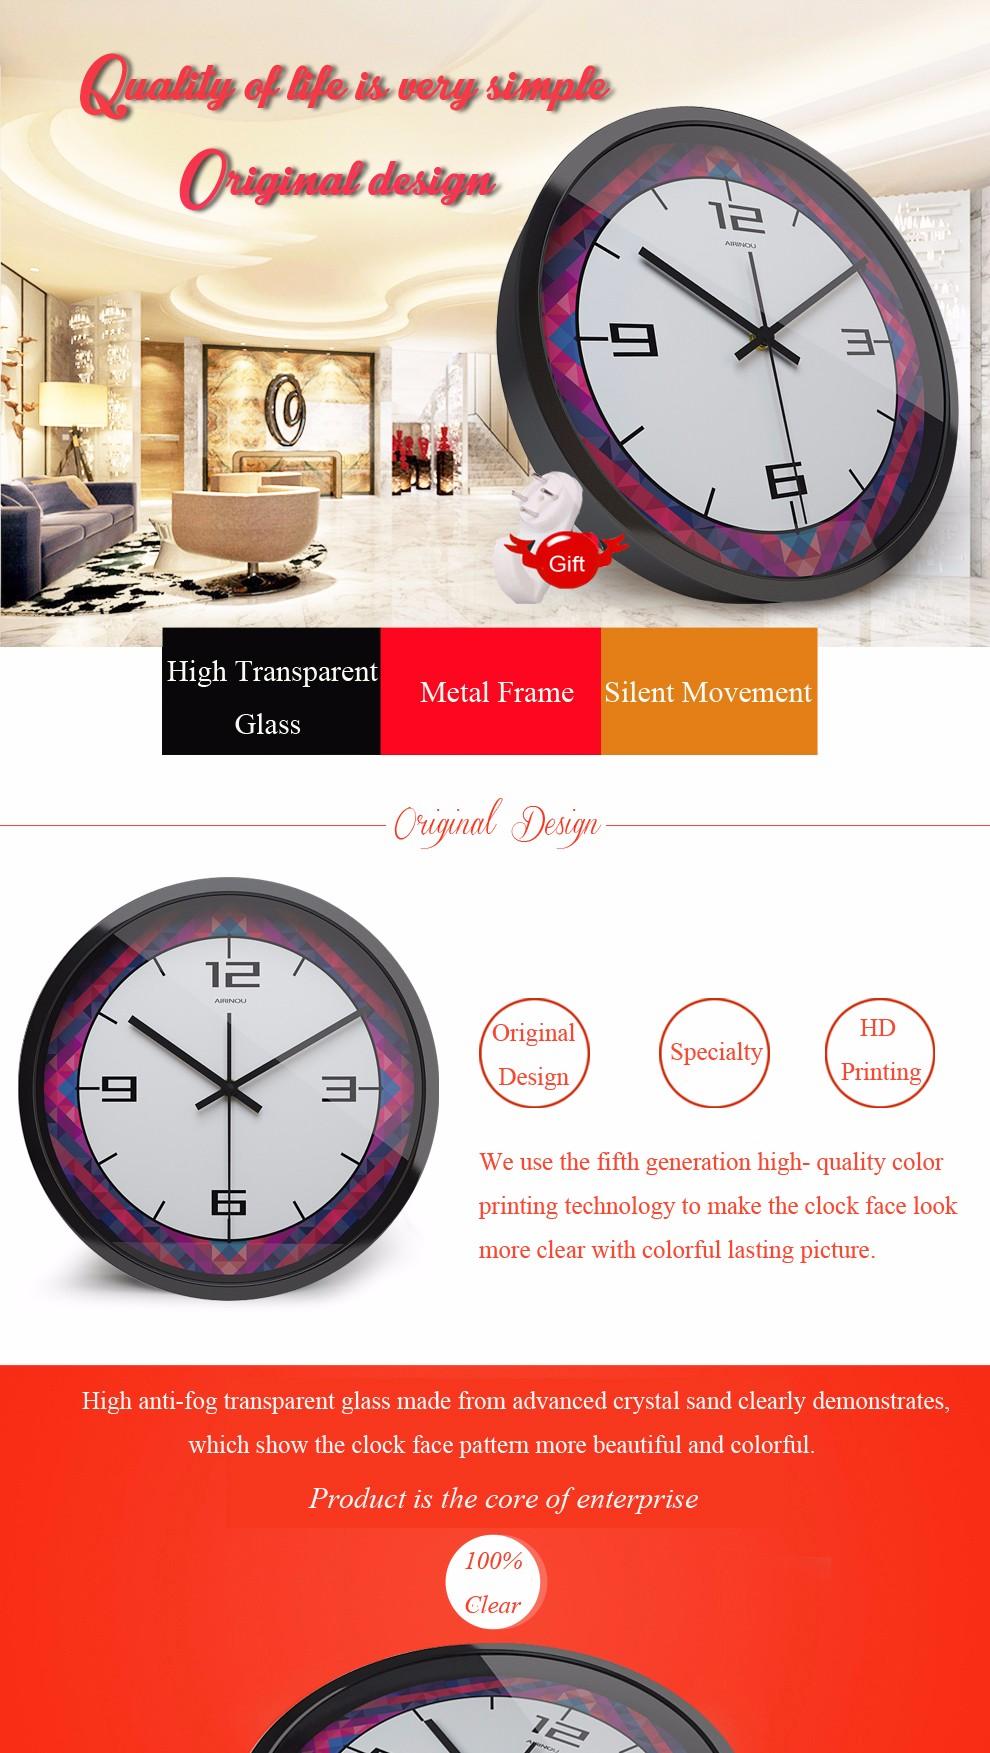 Airinou Original design The large diamond art clock